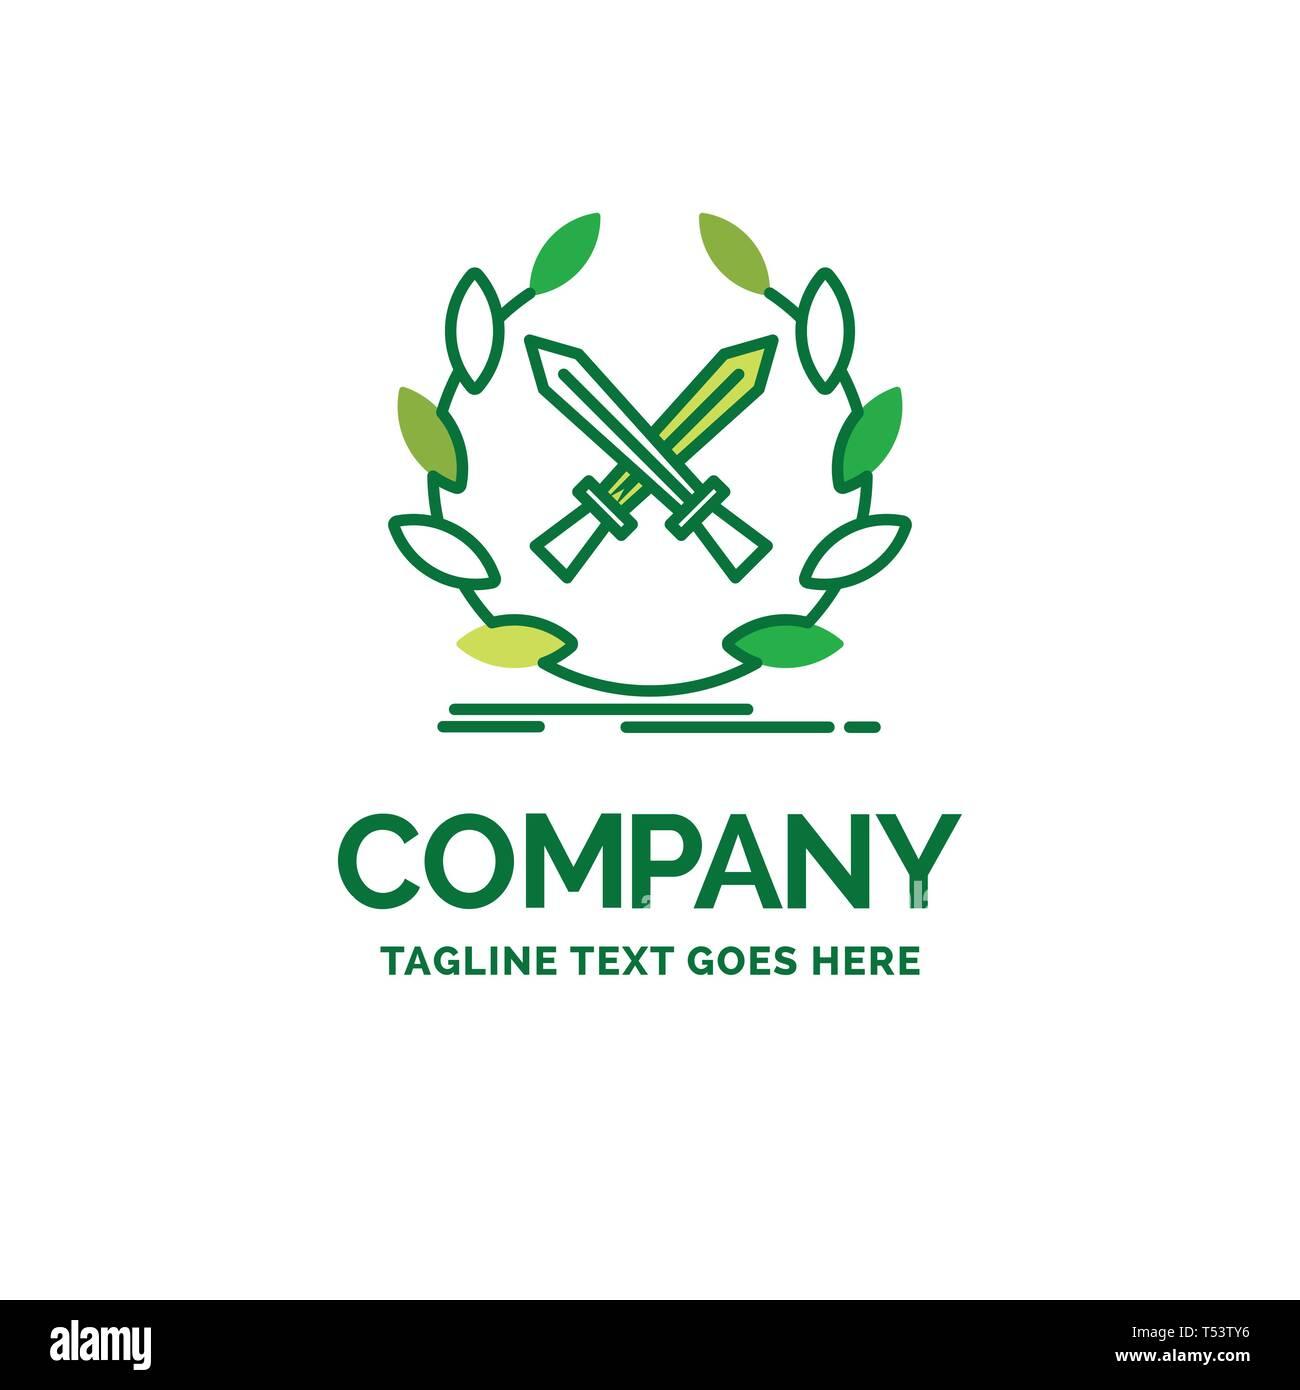 battle, emblem, game, label, swords Flat Business Logo template. Creative Green Brand Name Design. - Stock Image